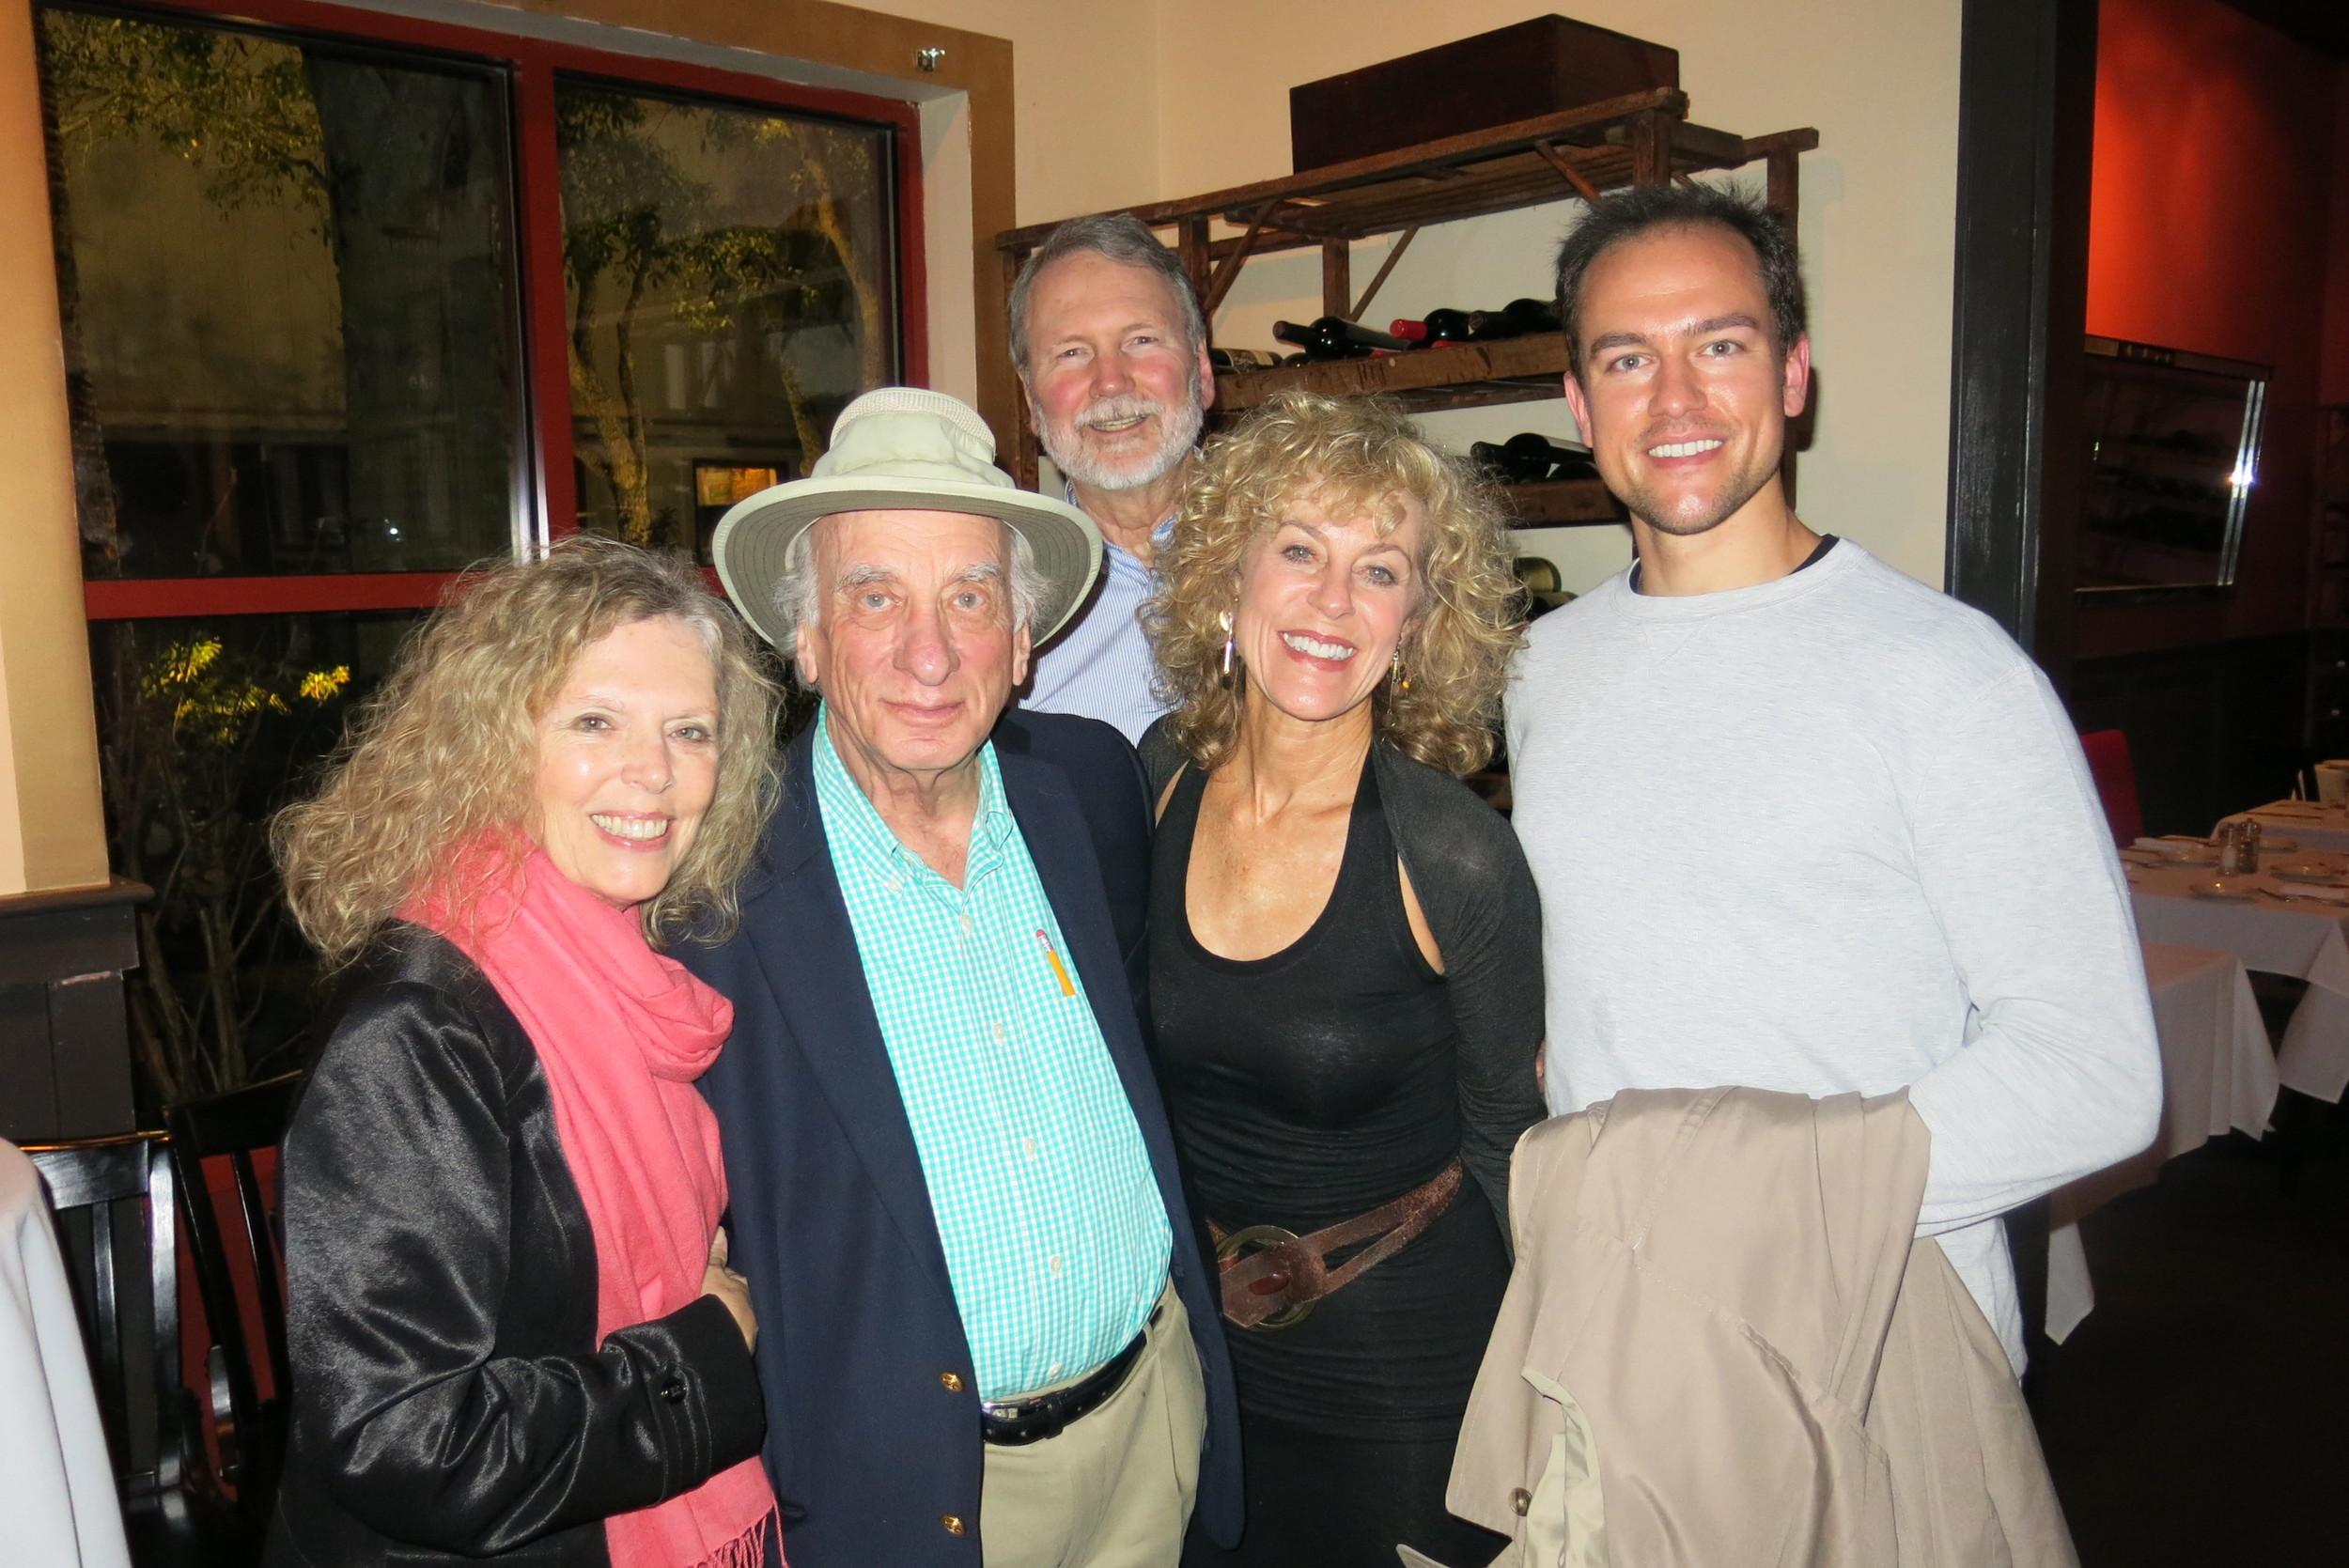 L to R  Jane Tolhurst (photographer), Dick Hyman, Fred Tolhurst (transportation), Judy, Kurt Heidolph